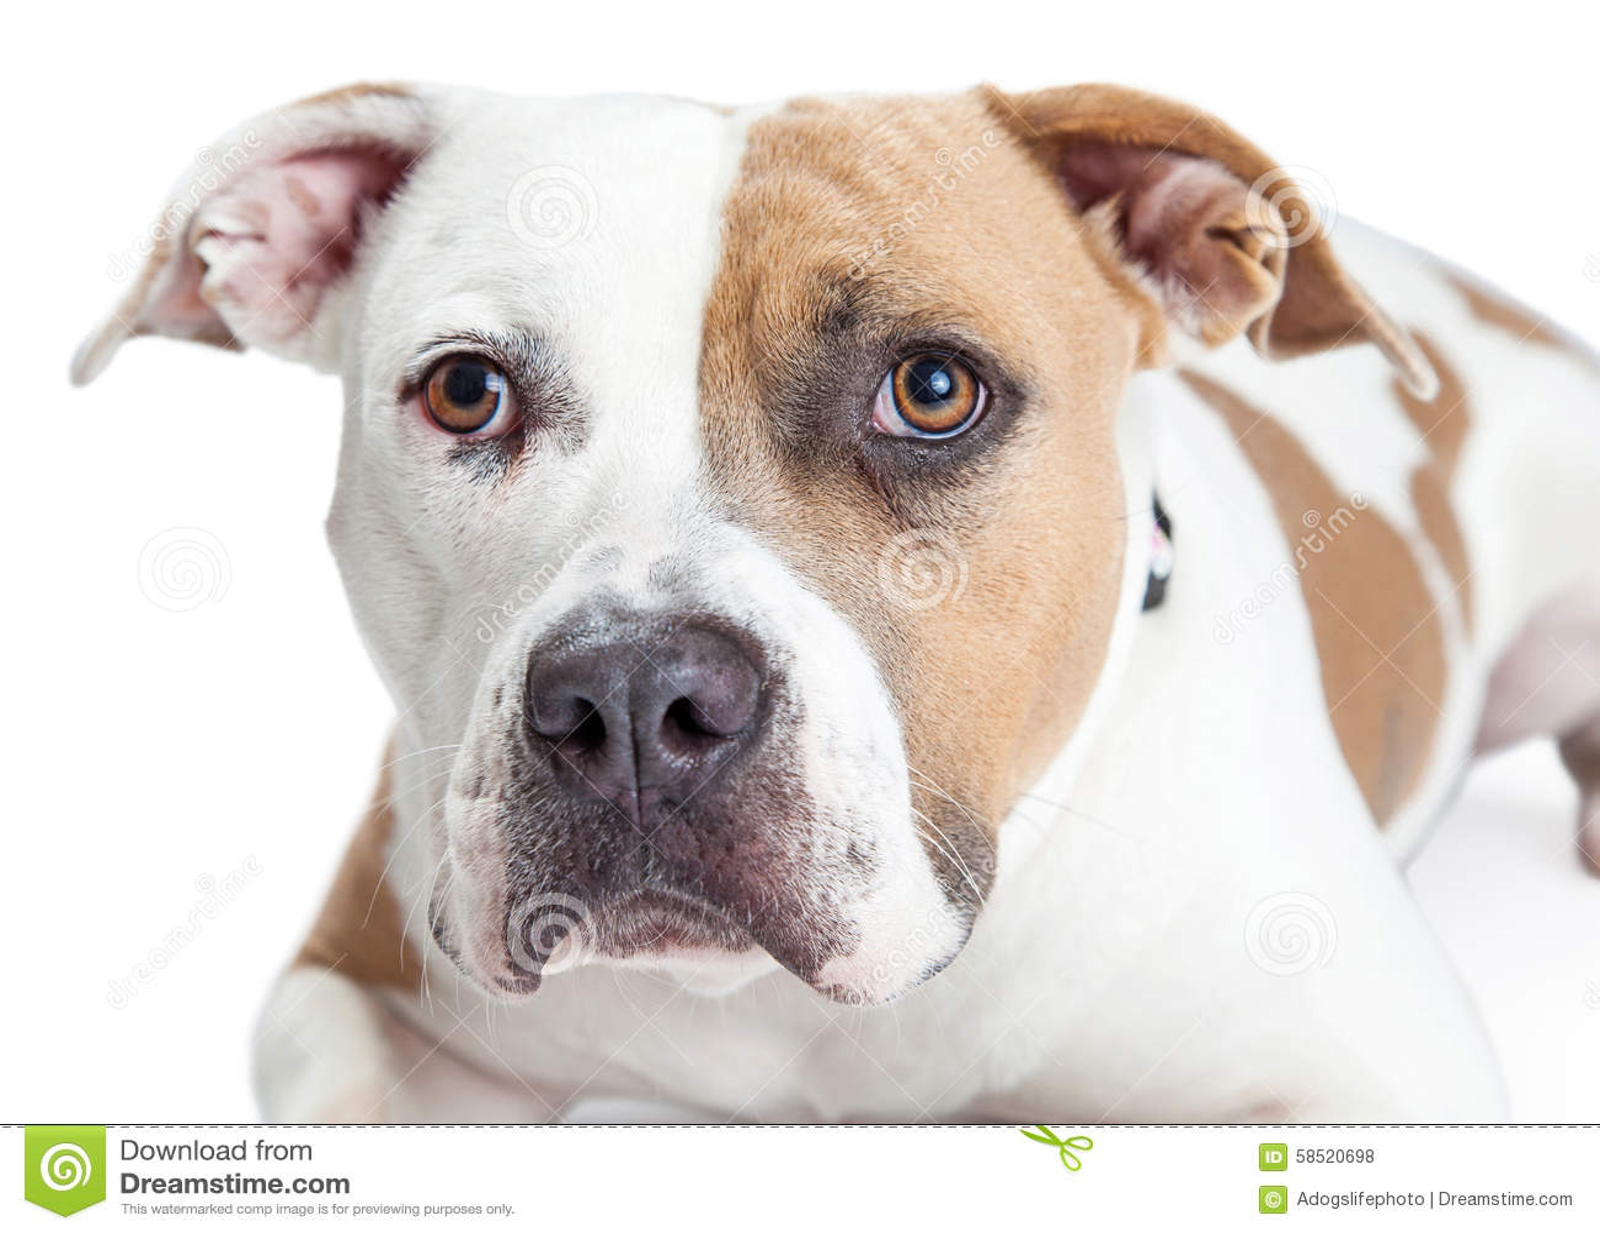 tan and white dog